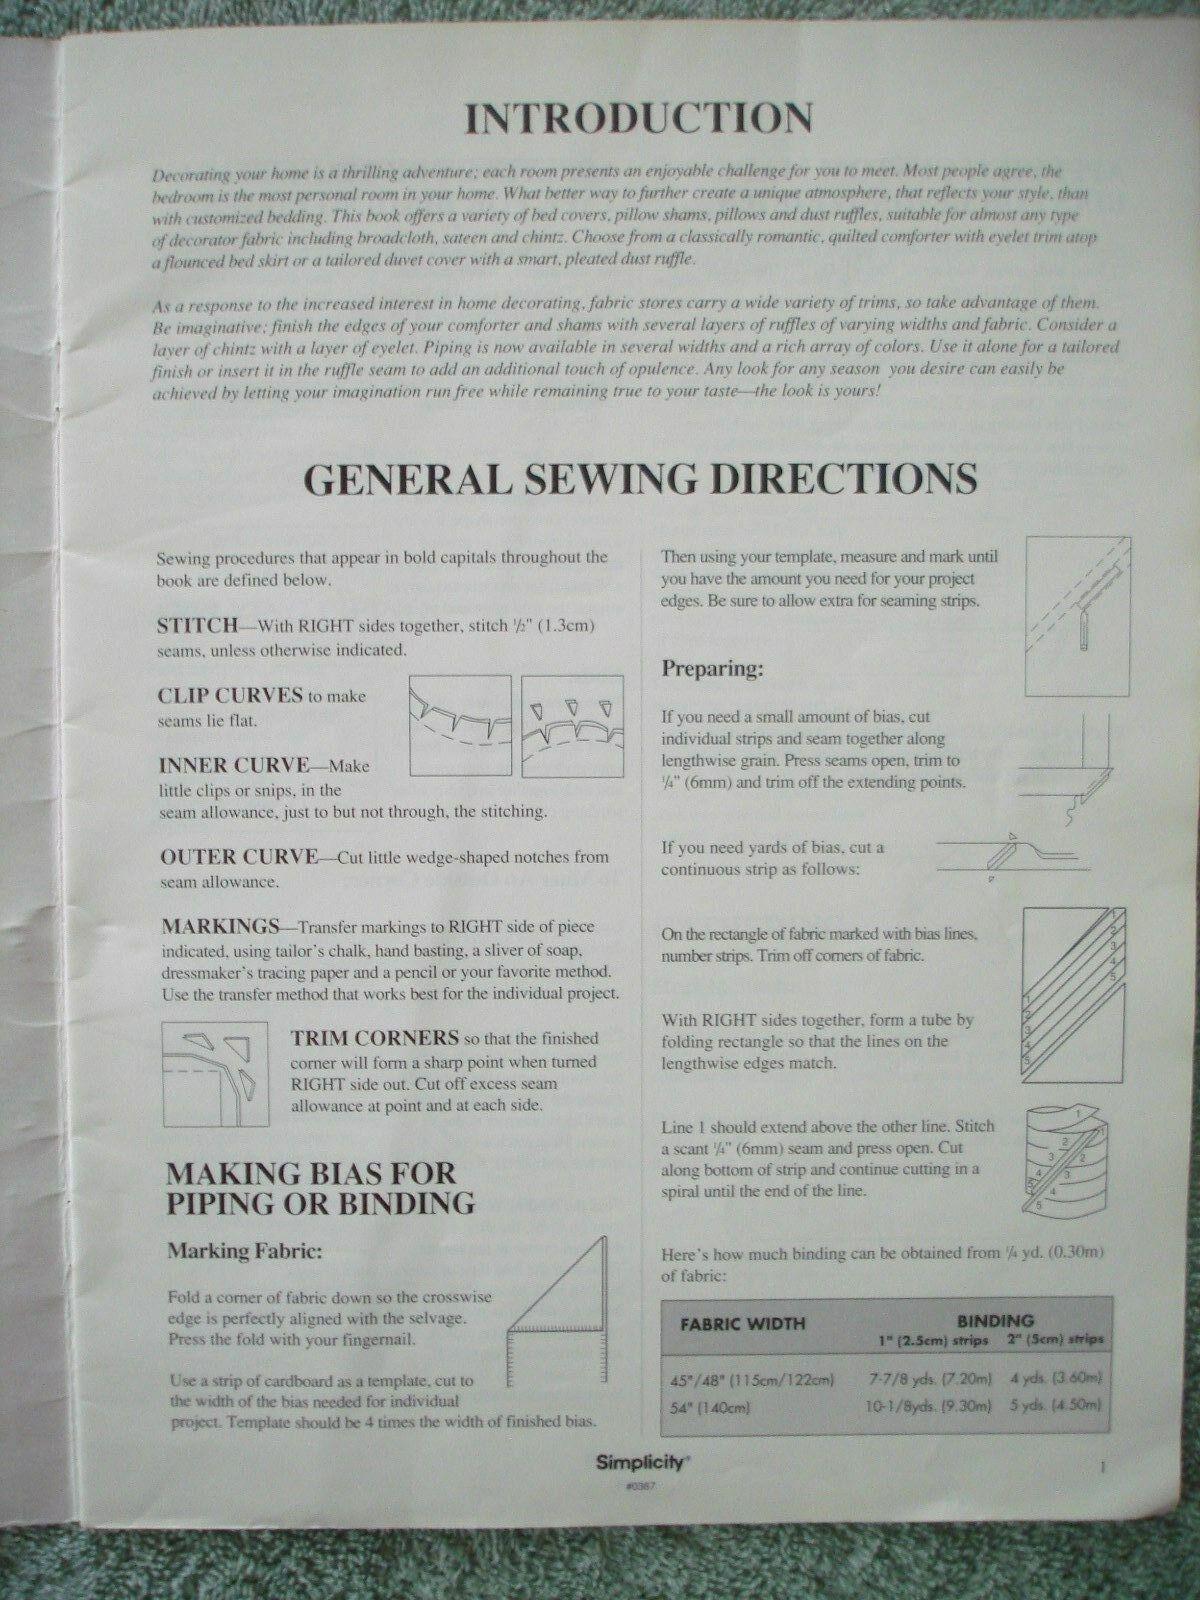 Vtg 1993 Simplicity DECOR Bedding Basics Instructional Pillows Comforters Duvets image 4